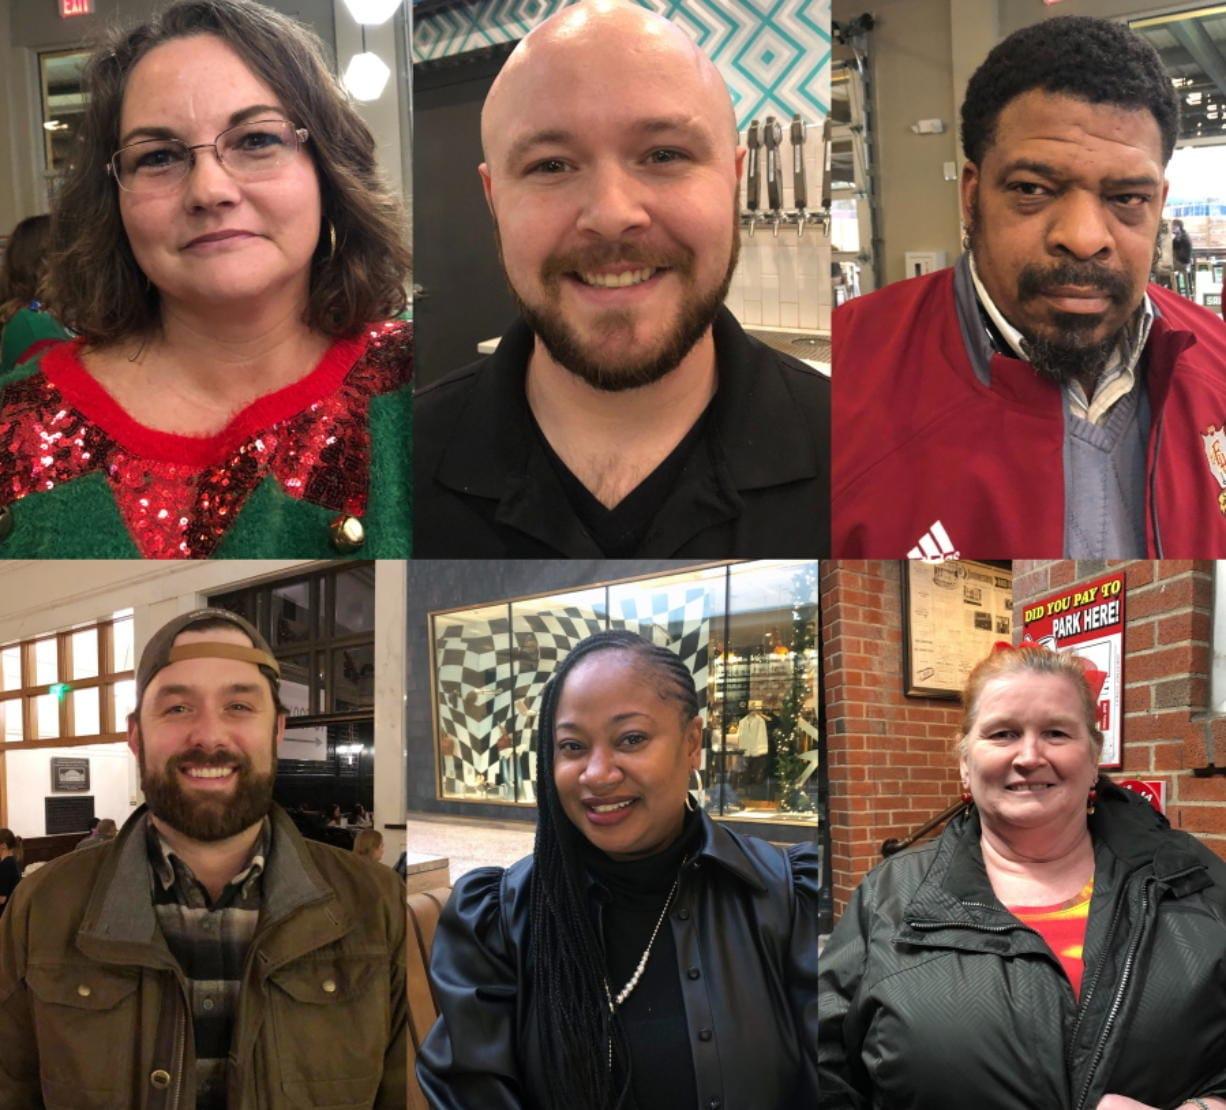 This combination of photographs shows, top row from left: Aimee Brewer, Ben Bolen, Mark McQueen, bottom row from left: Morgan O'Sullivan, Natasha Adams, Alice Cutting, Wednesday, Dec. 18, 2019.